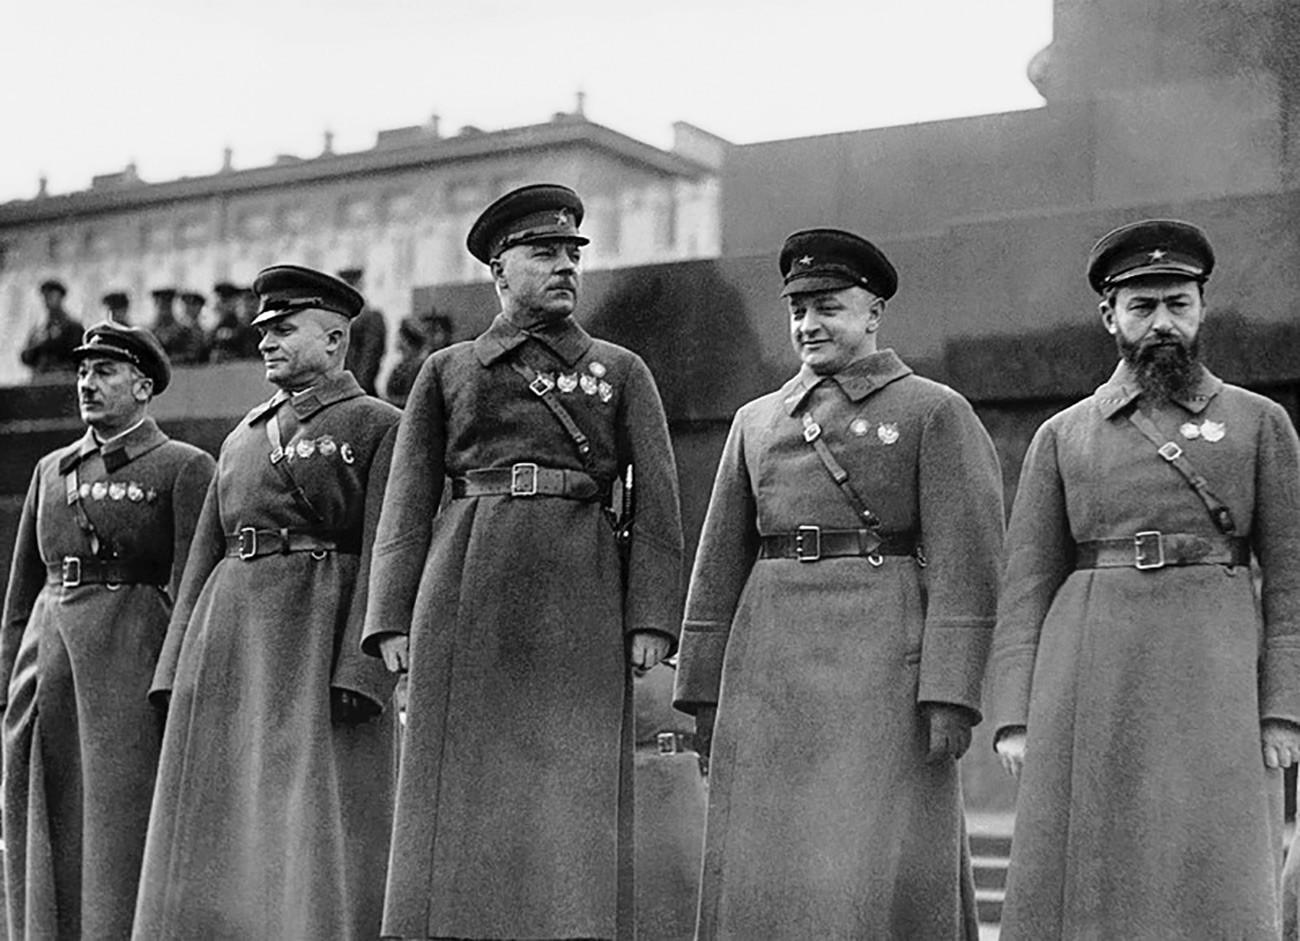 Guenrikh Igoda, Aleksandr Egorov, Kliment Vorochilov, Milkhail Tukhatchevski e Ian Gamarik na Praça Vermelha.